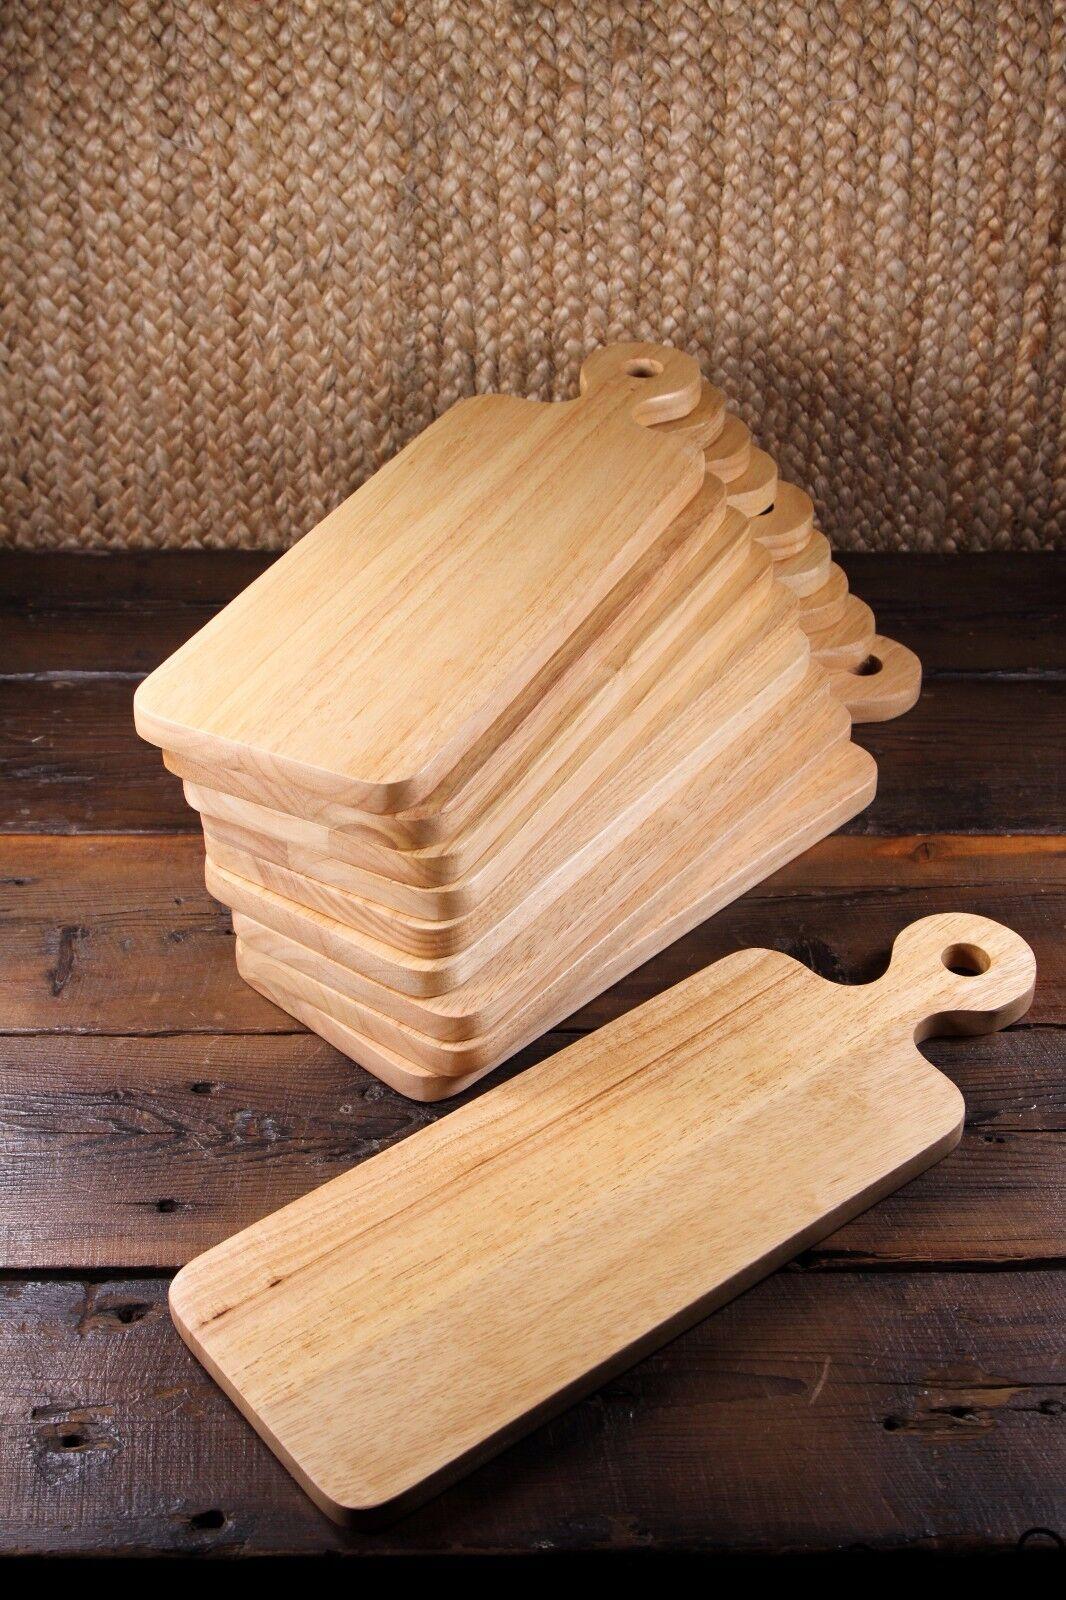 10 X en bois rectangulaire fromage Board Paddle Solide Bois Cuisine Essentials